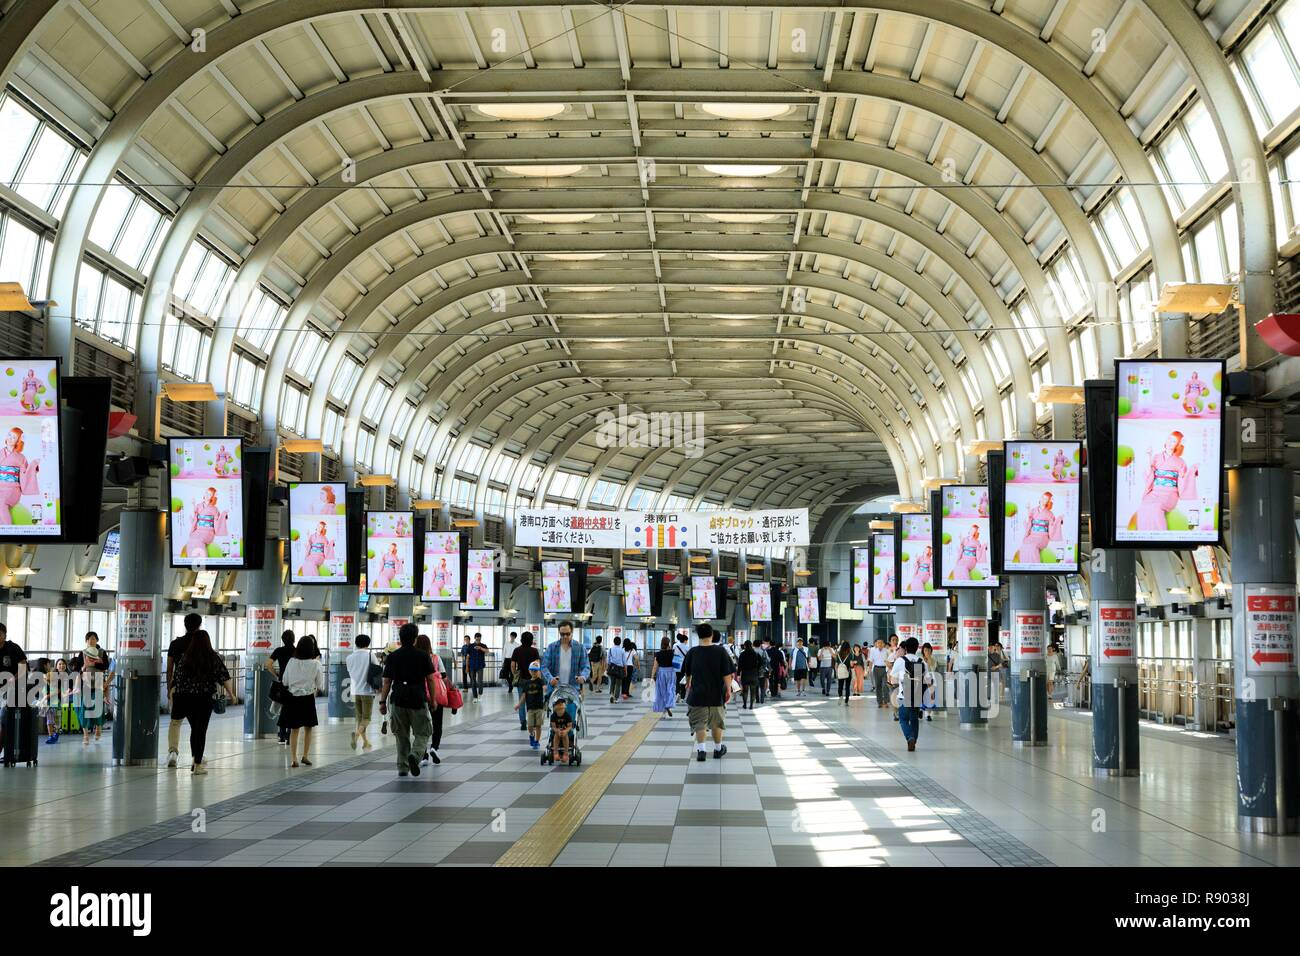 Japan, Honshu Island, Tokyo, Minato ku district, Shinagawa station Stock Photo